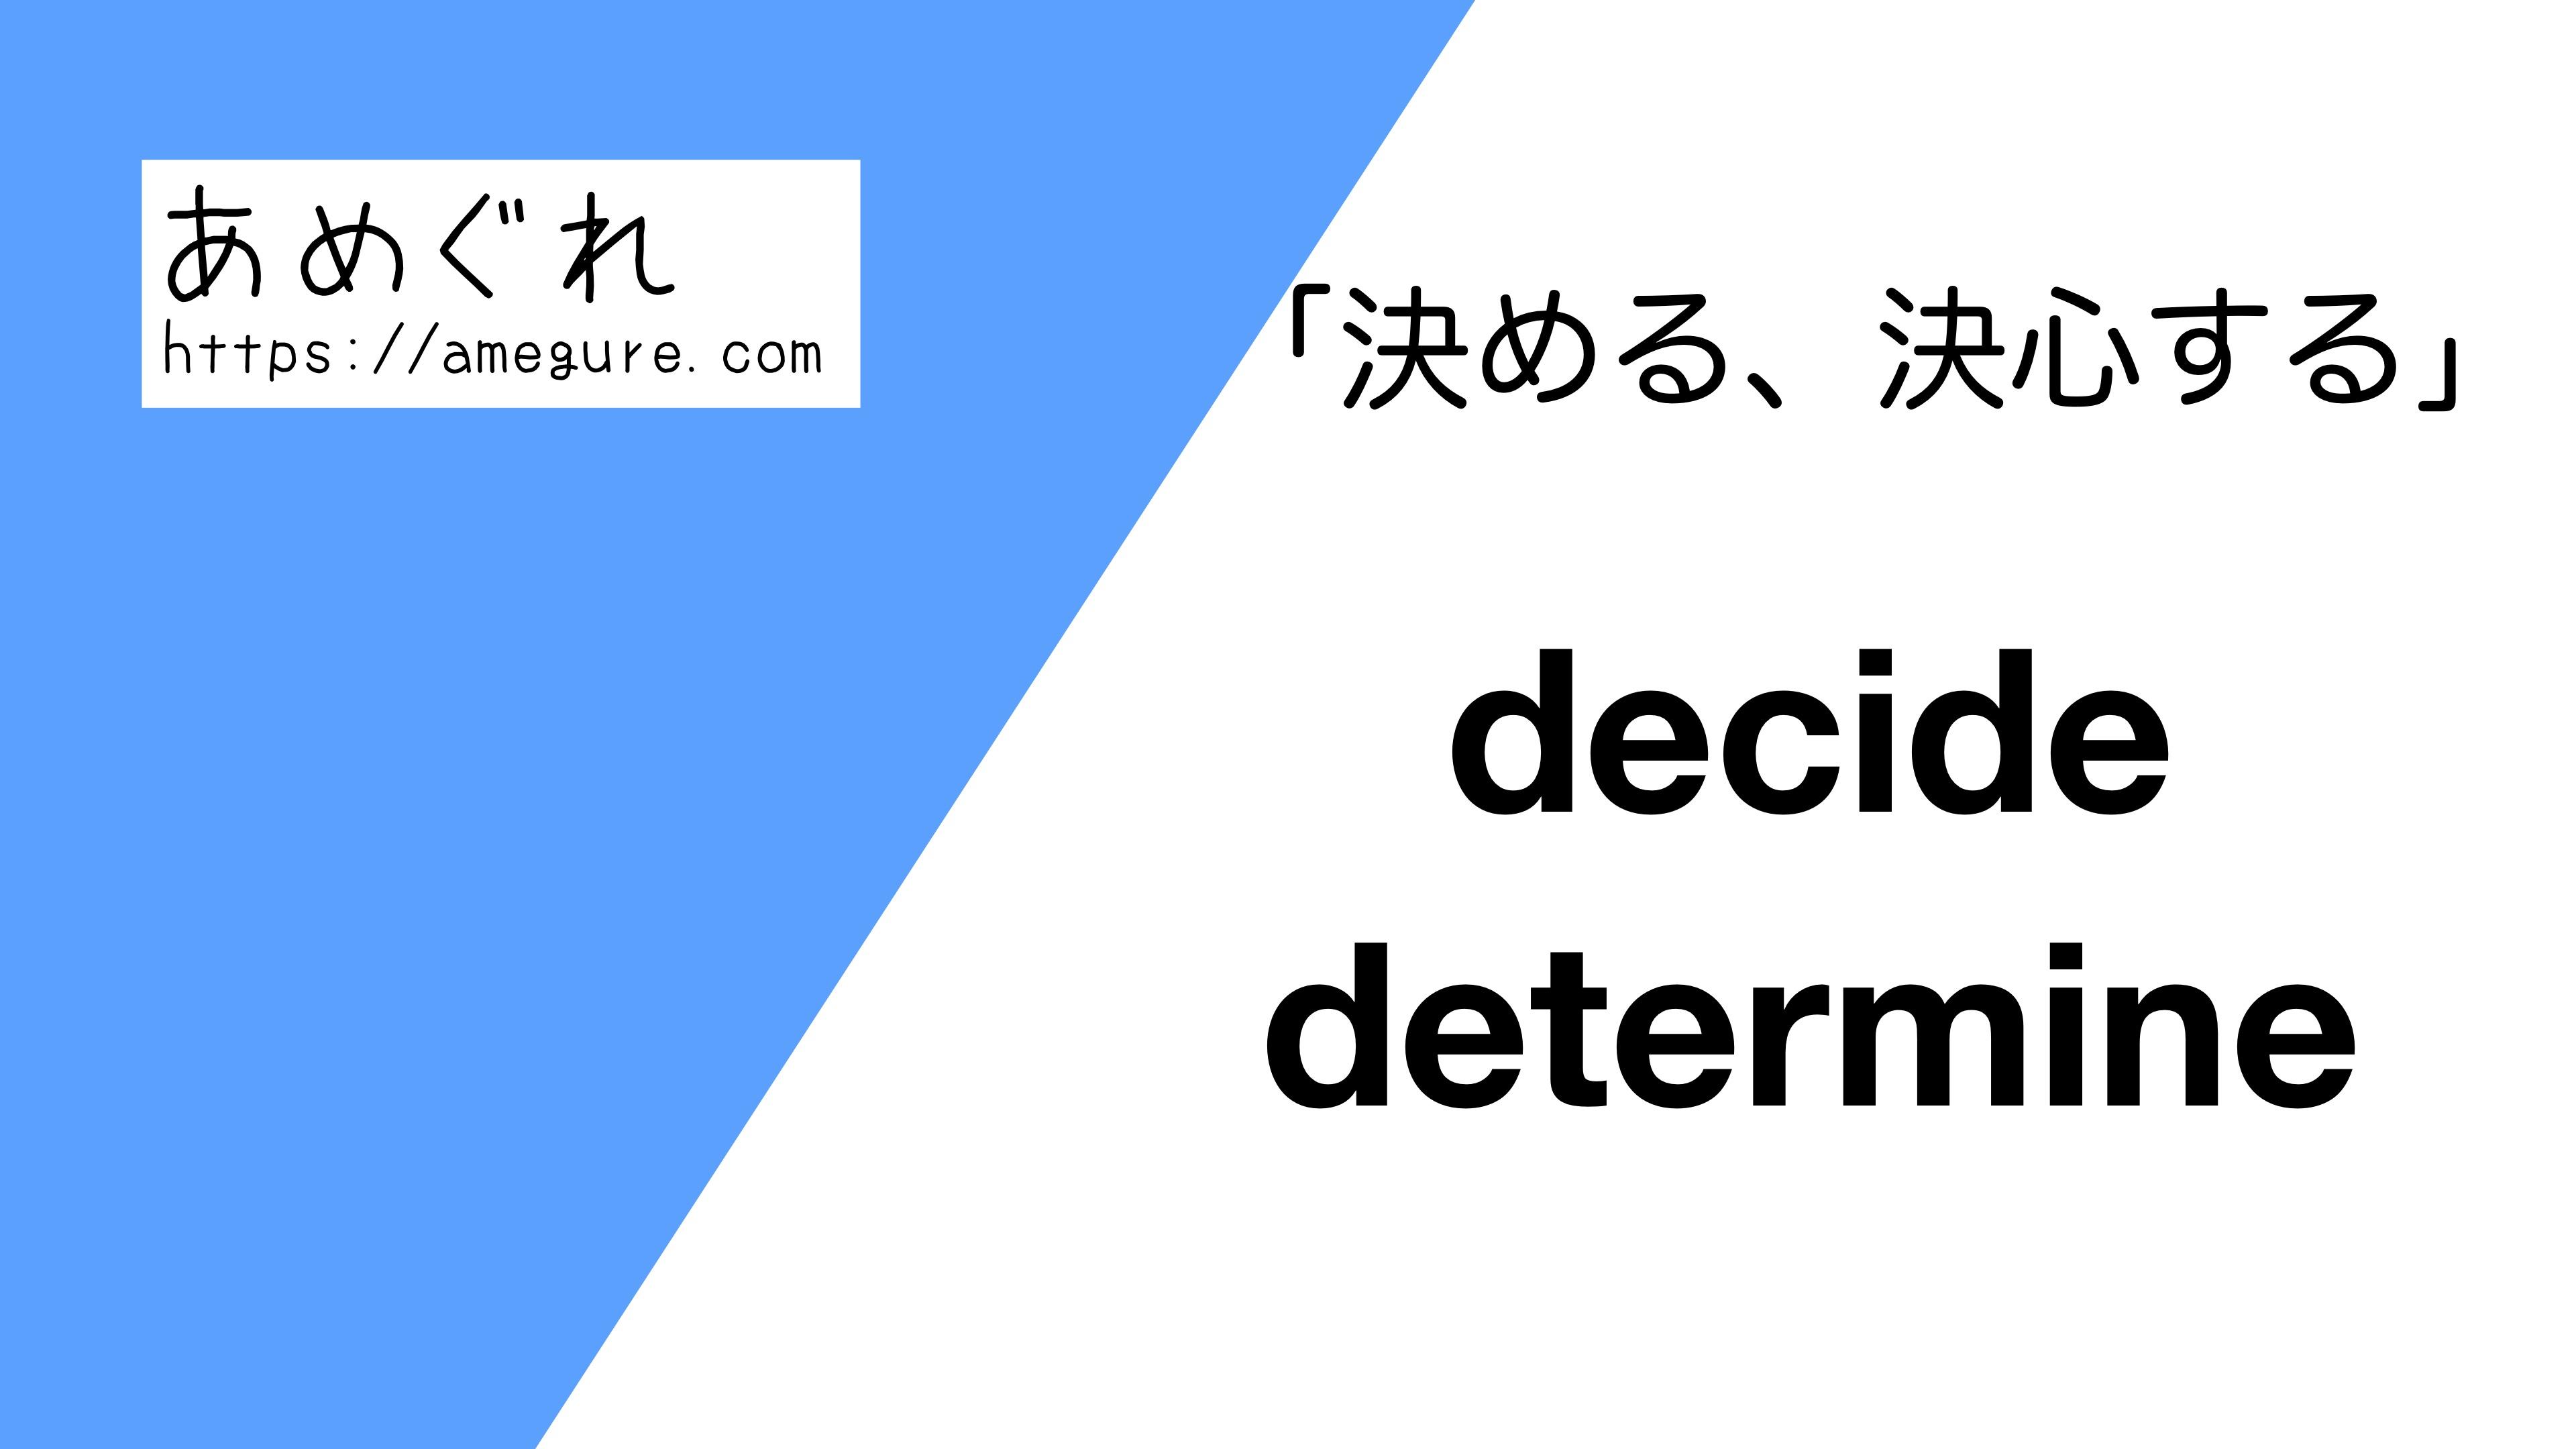 decide-determine違い